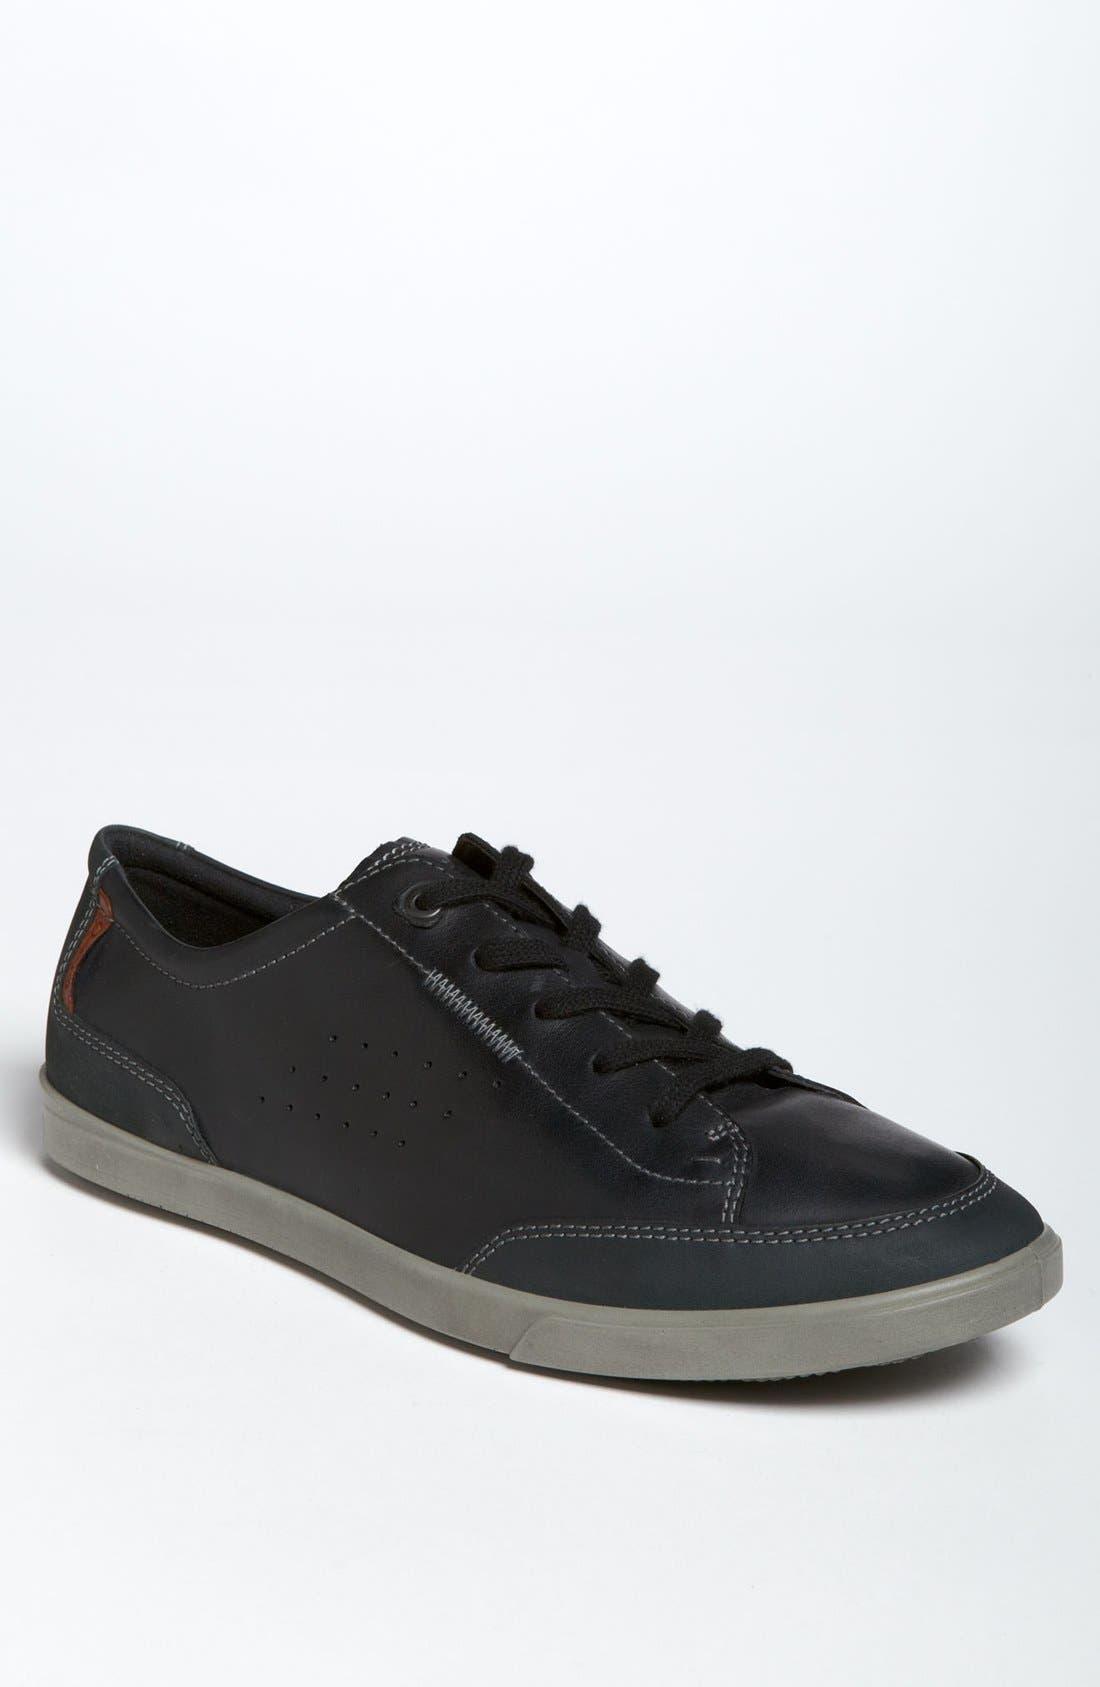 'Collin' Sneaker,                             Main thumbnail 1, color,                             001